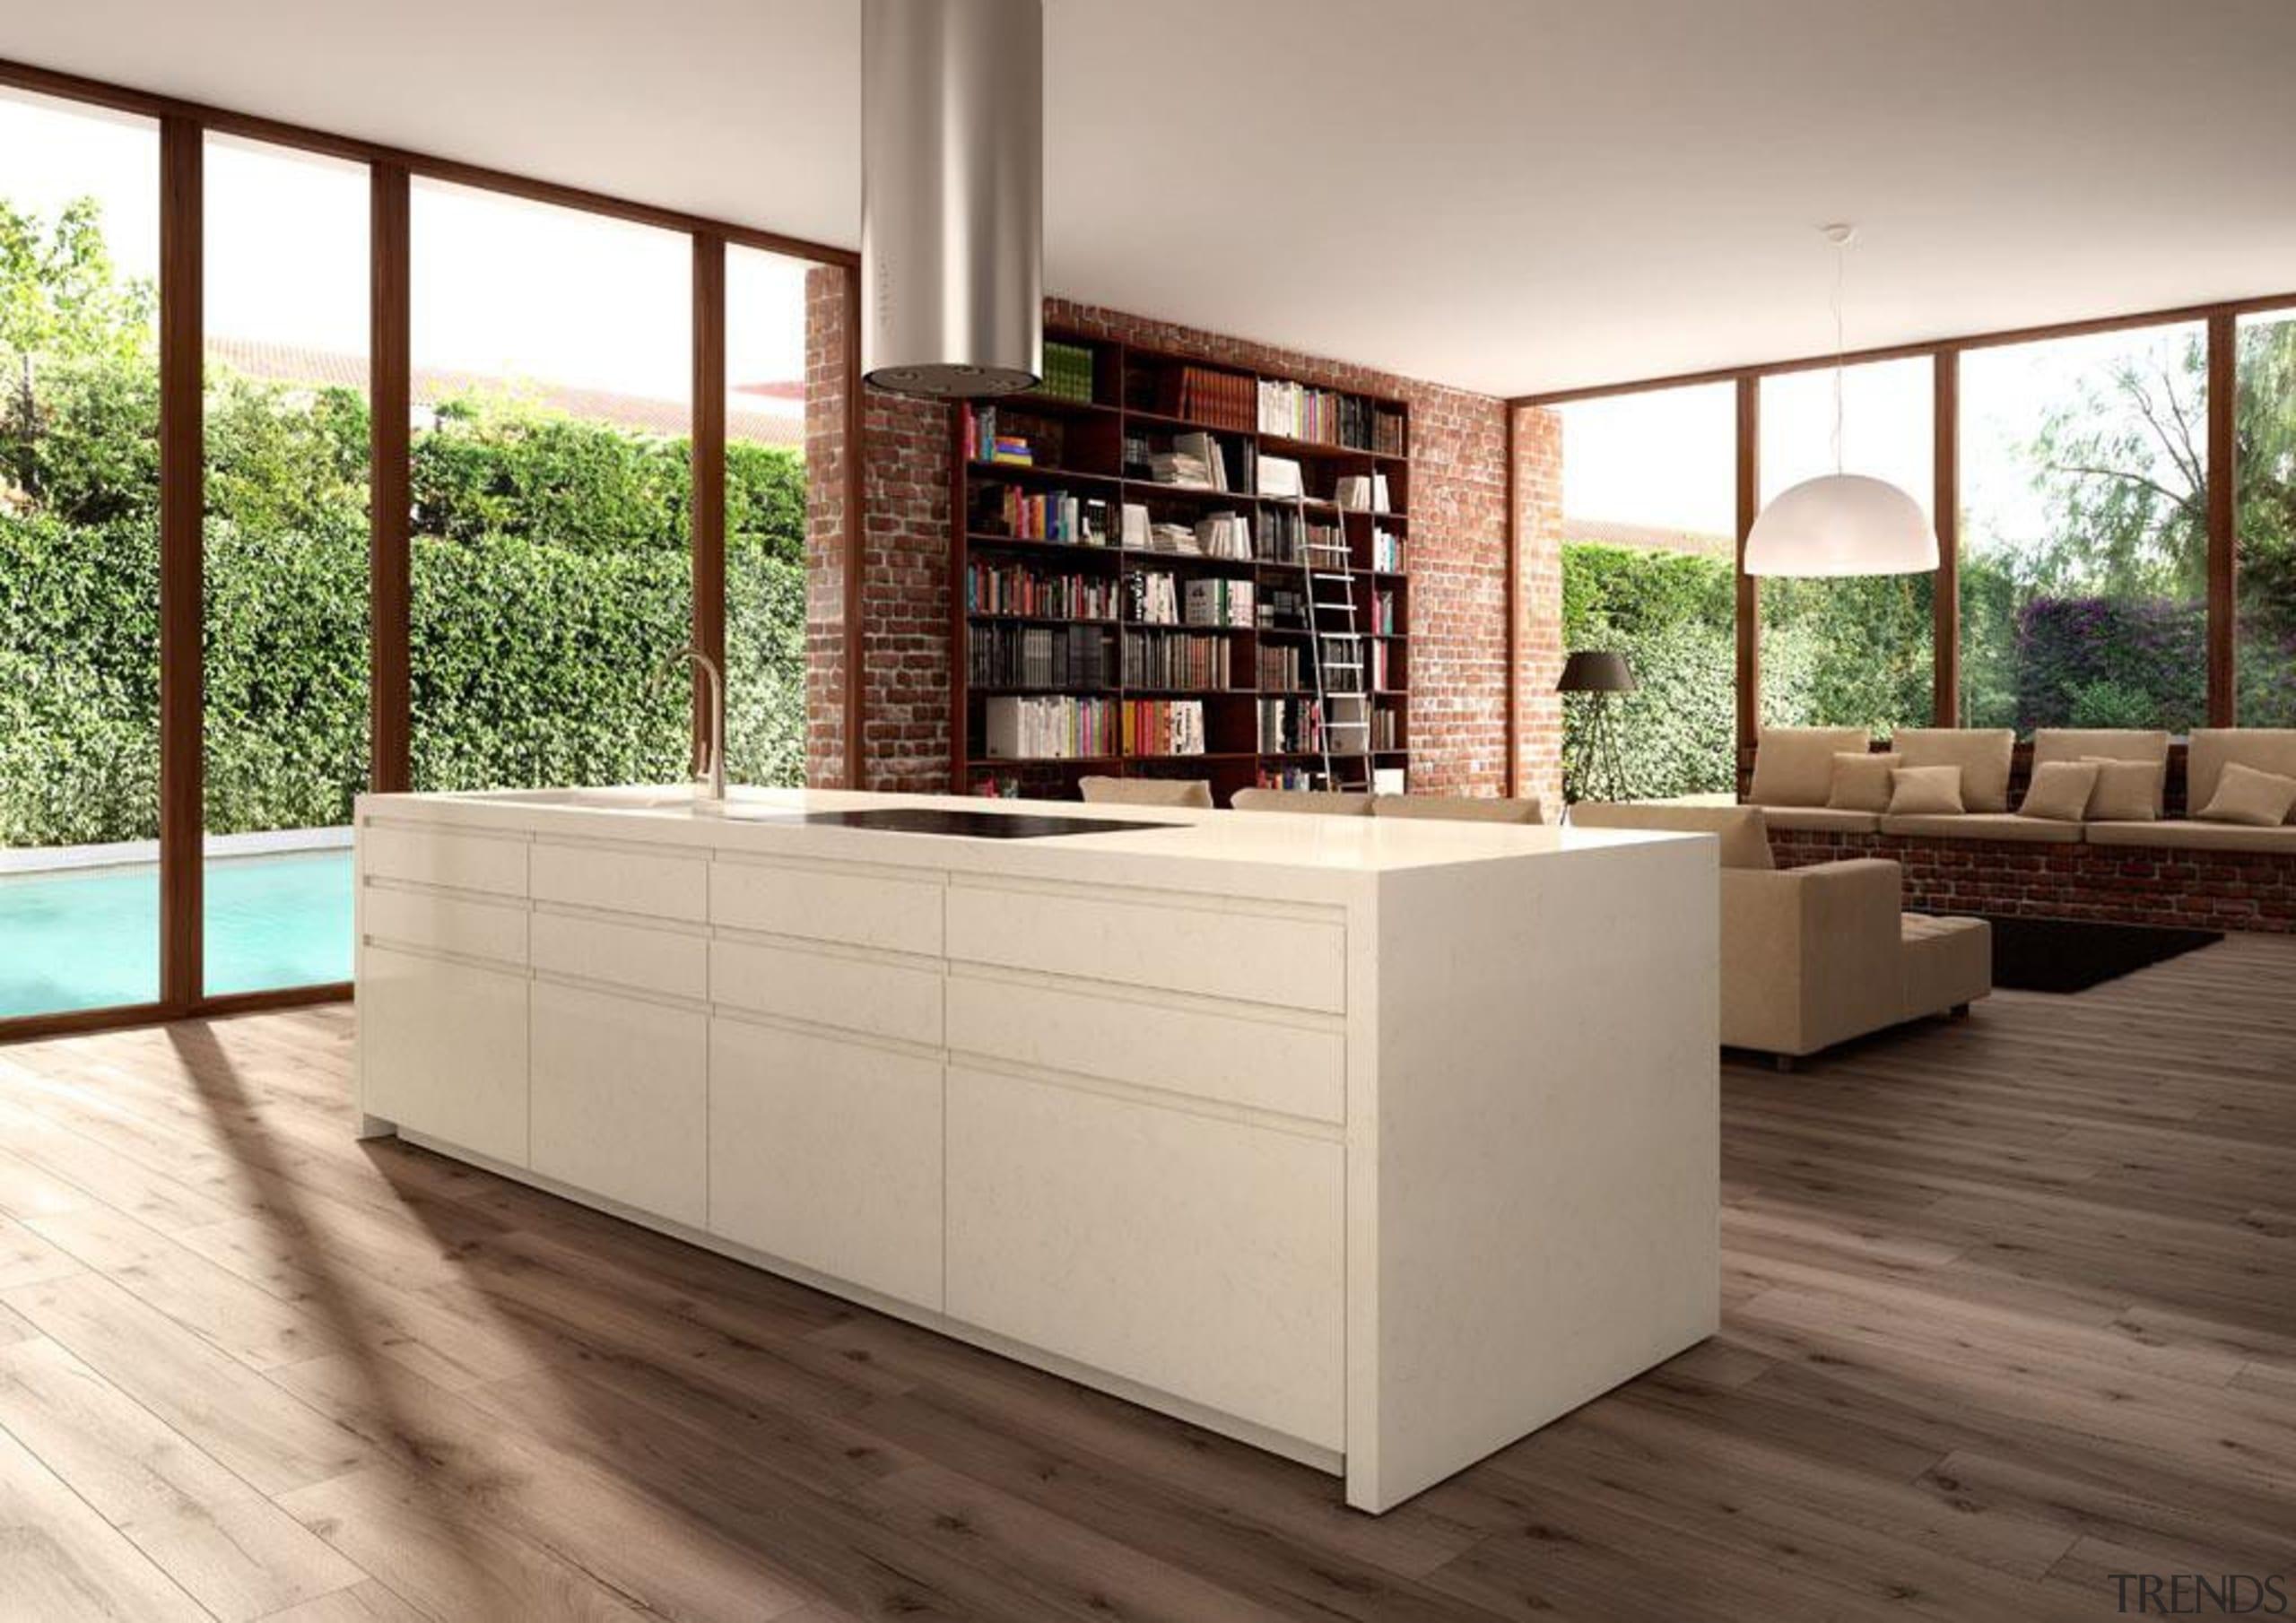 dreamy marfil living room.jpg - dreamy_marfil_living_room.jpg - floor floor, flooring, furniture, hardwood, interior design, wood, gray, brown